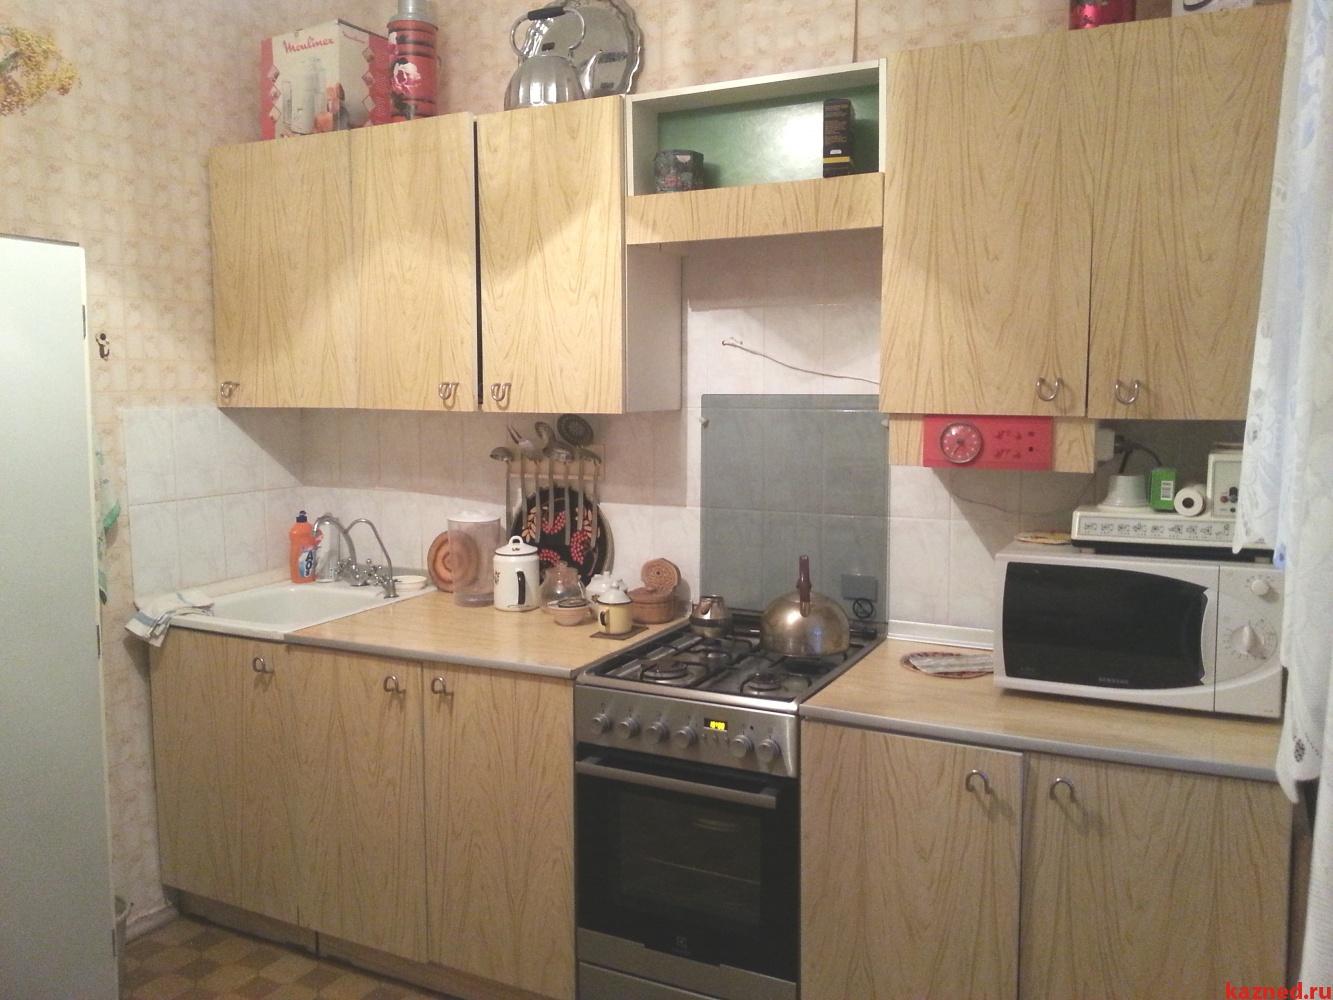 Продажа 2-к квартиры Фучика, 16, 53 м2  (миниатюра №4)